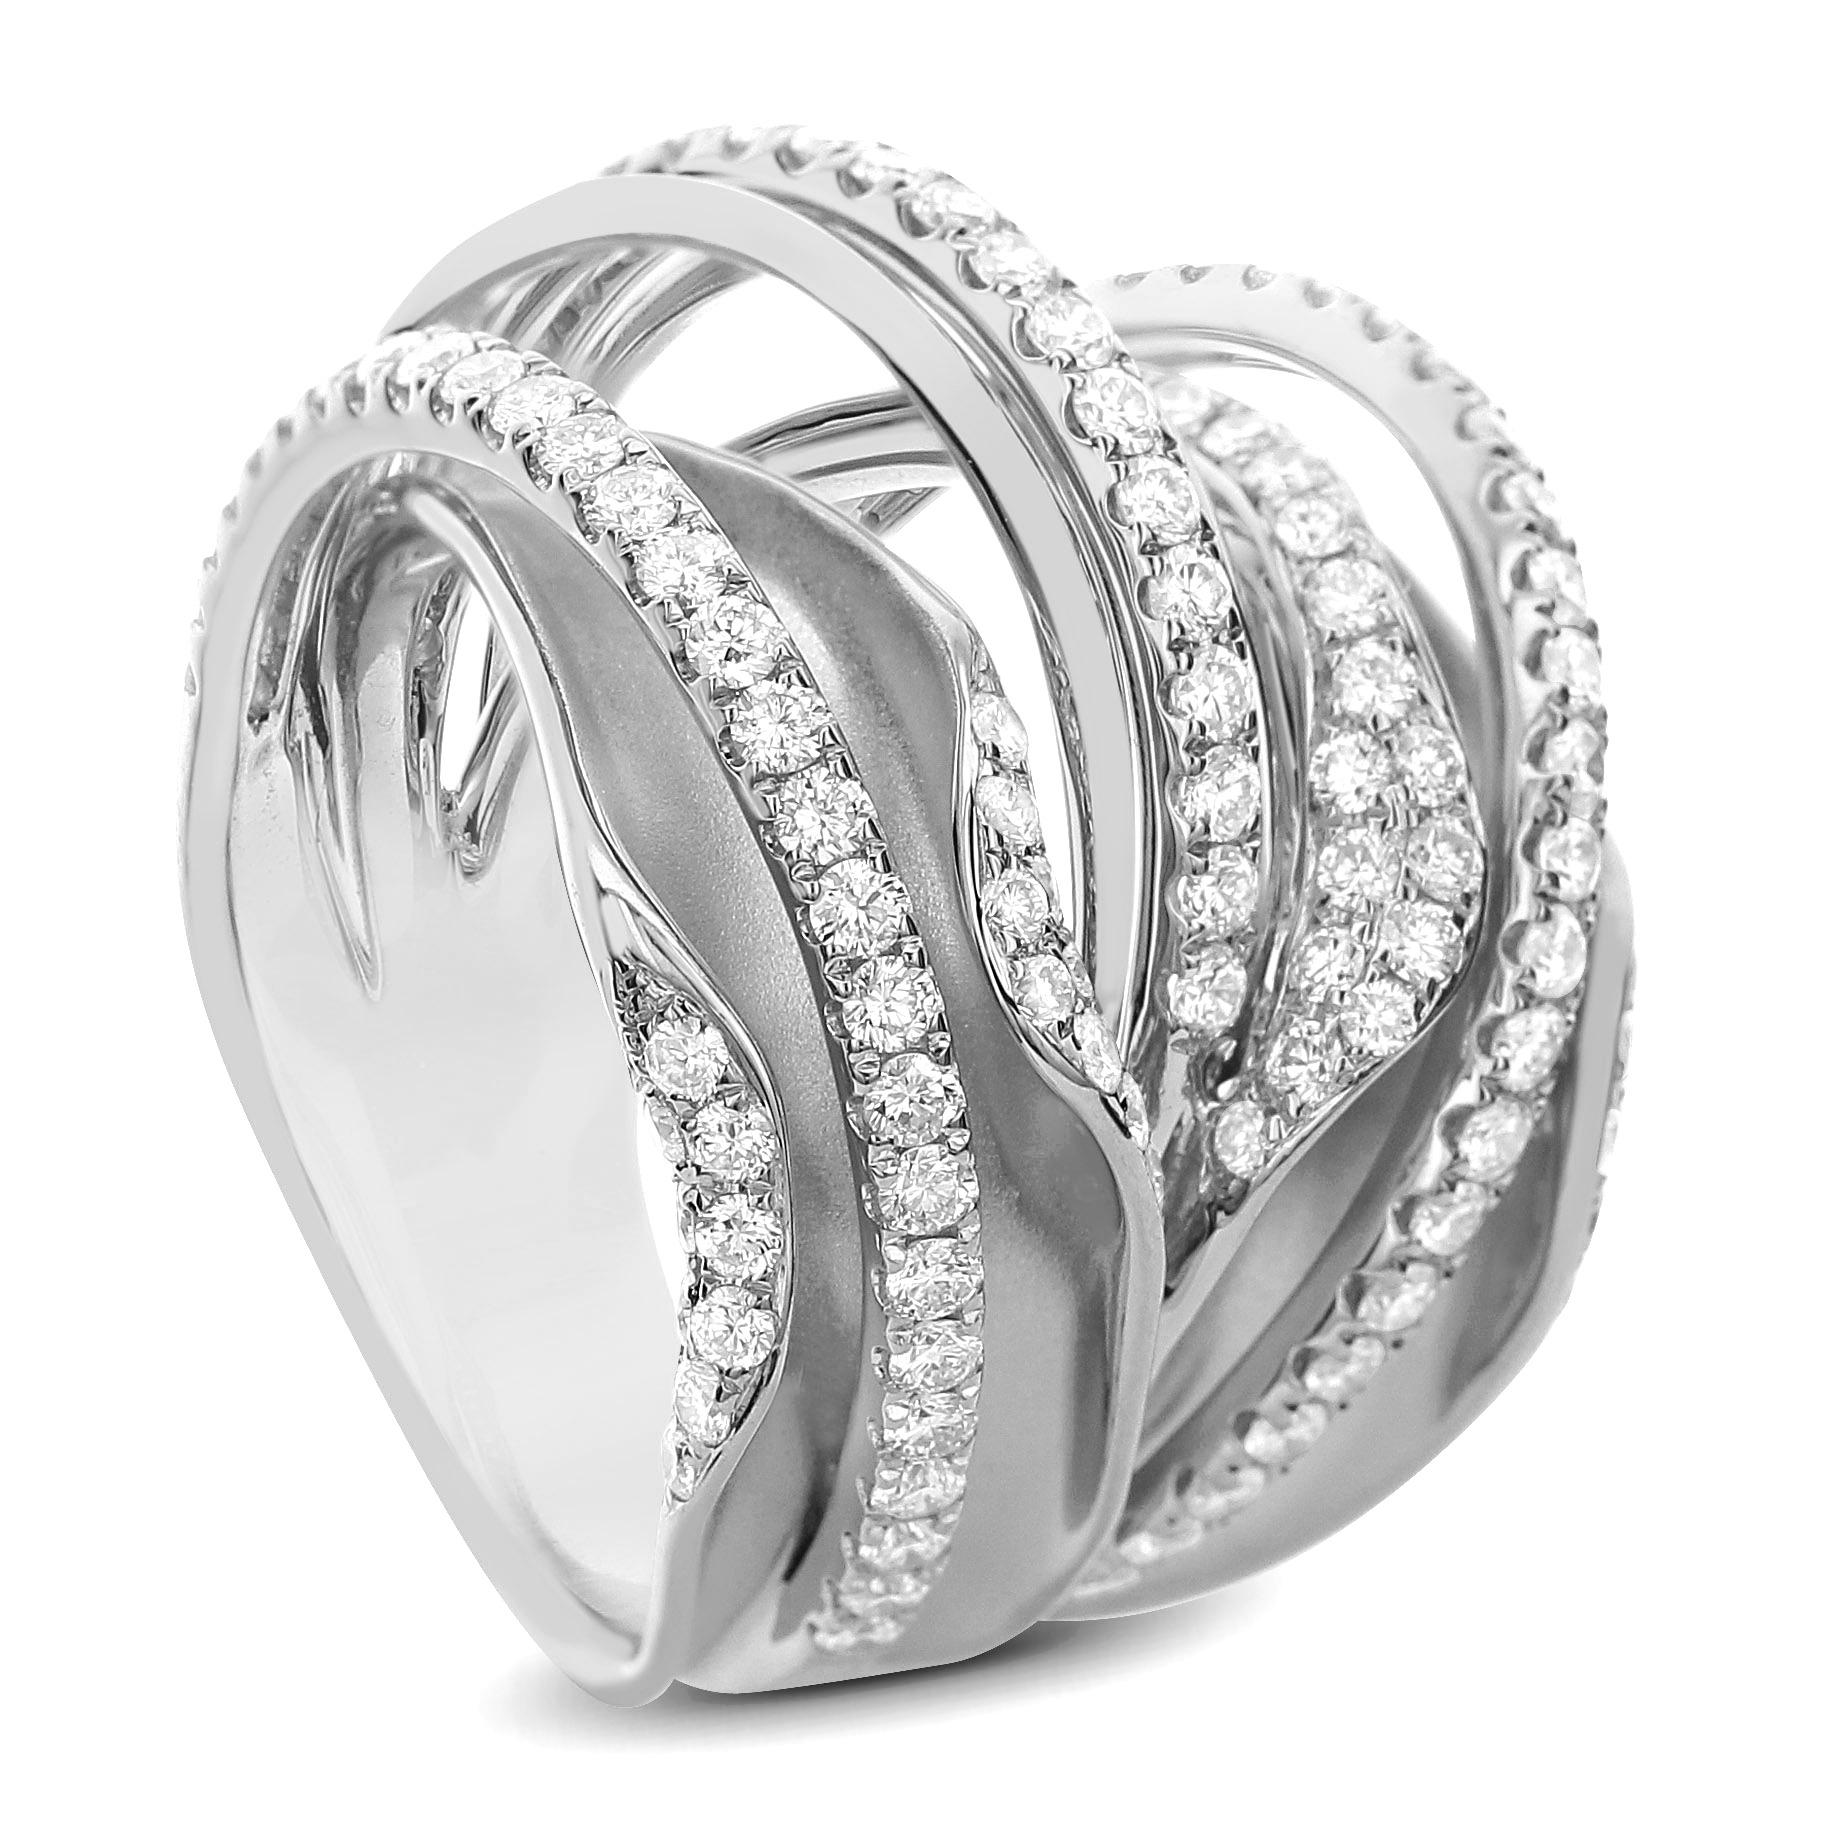 Favourite Jewelry stores Omaha (14 KARAT) | Voynetch